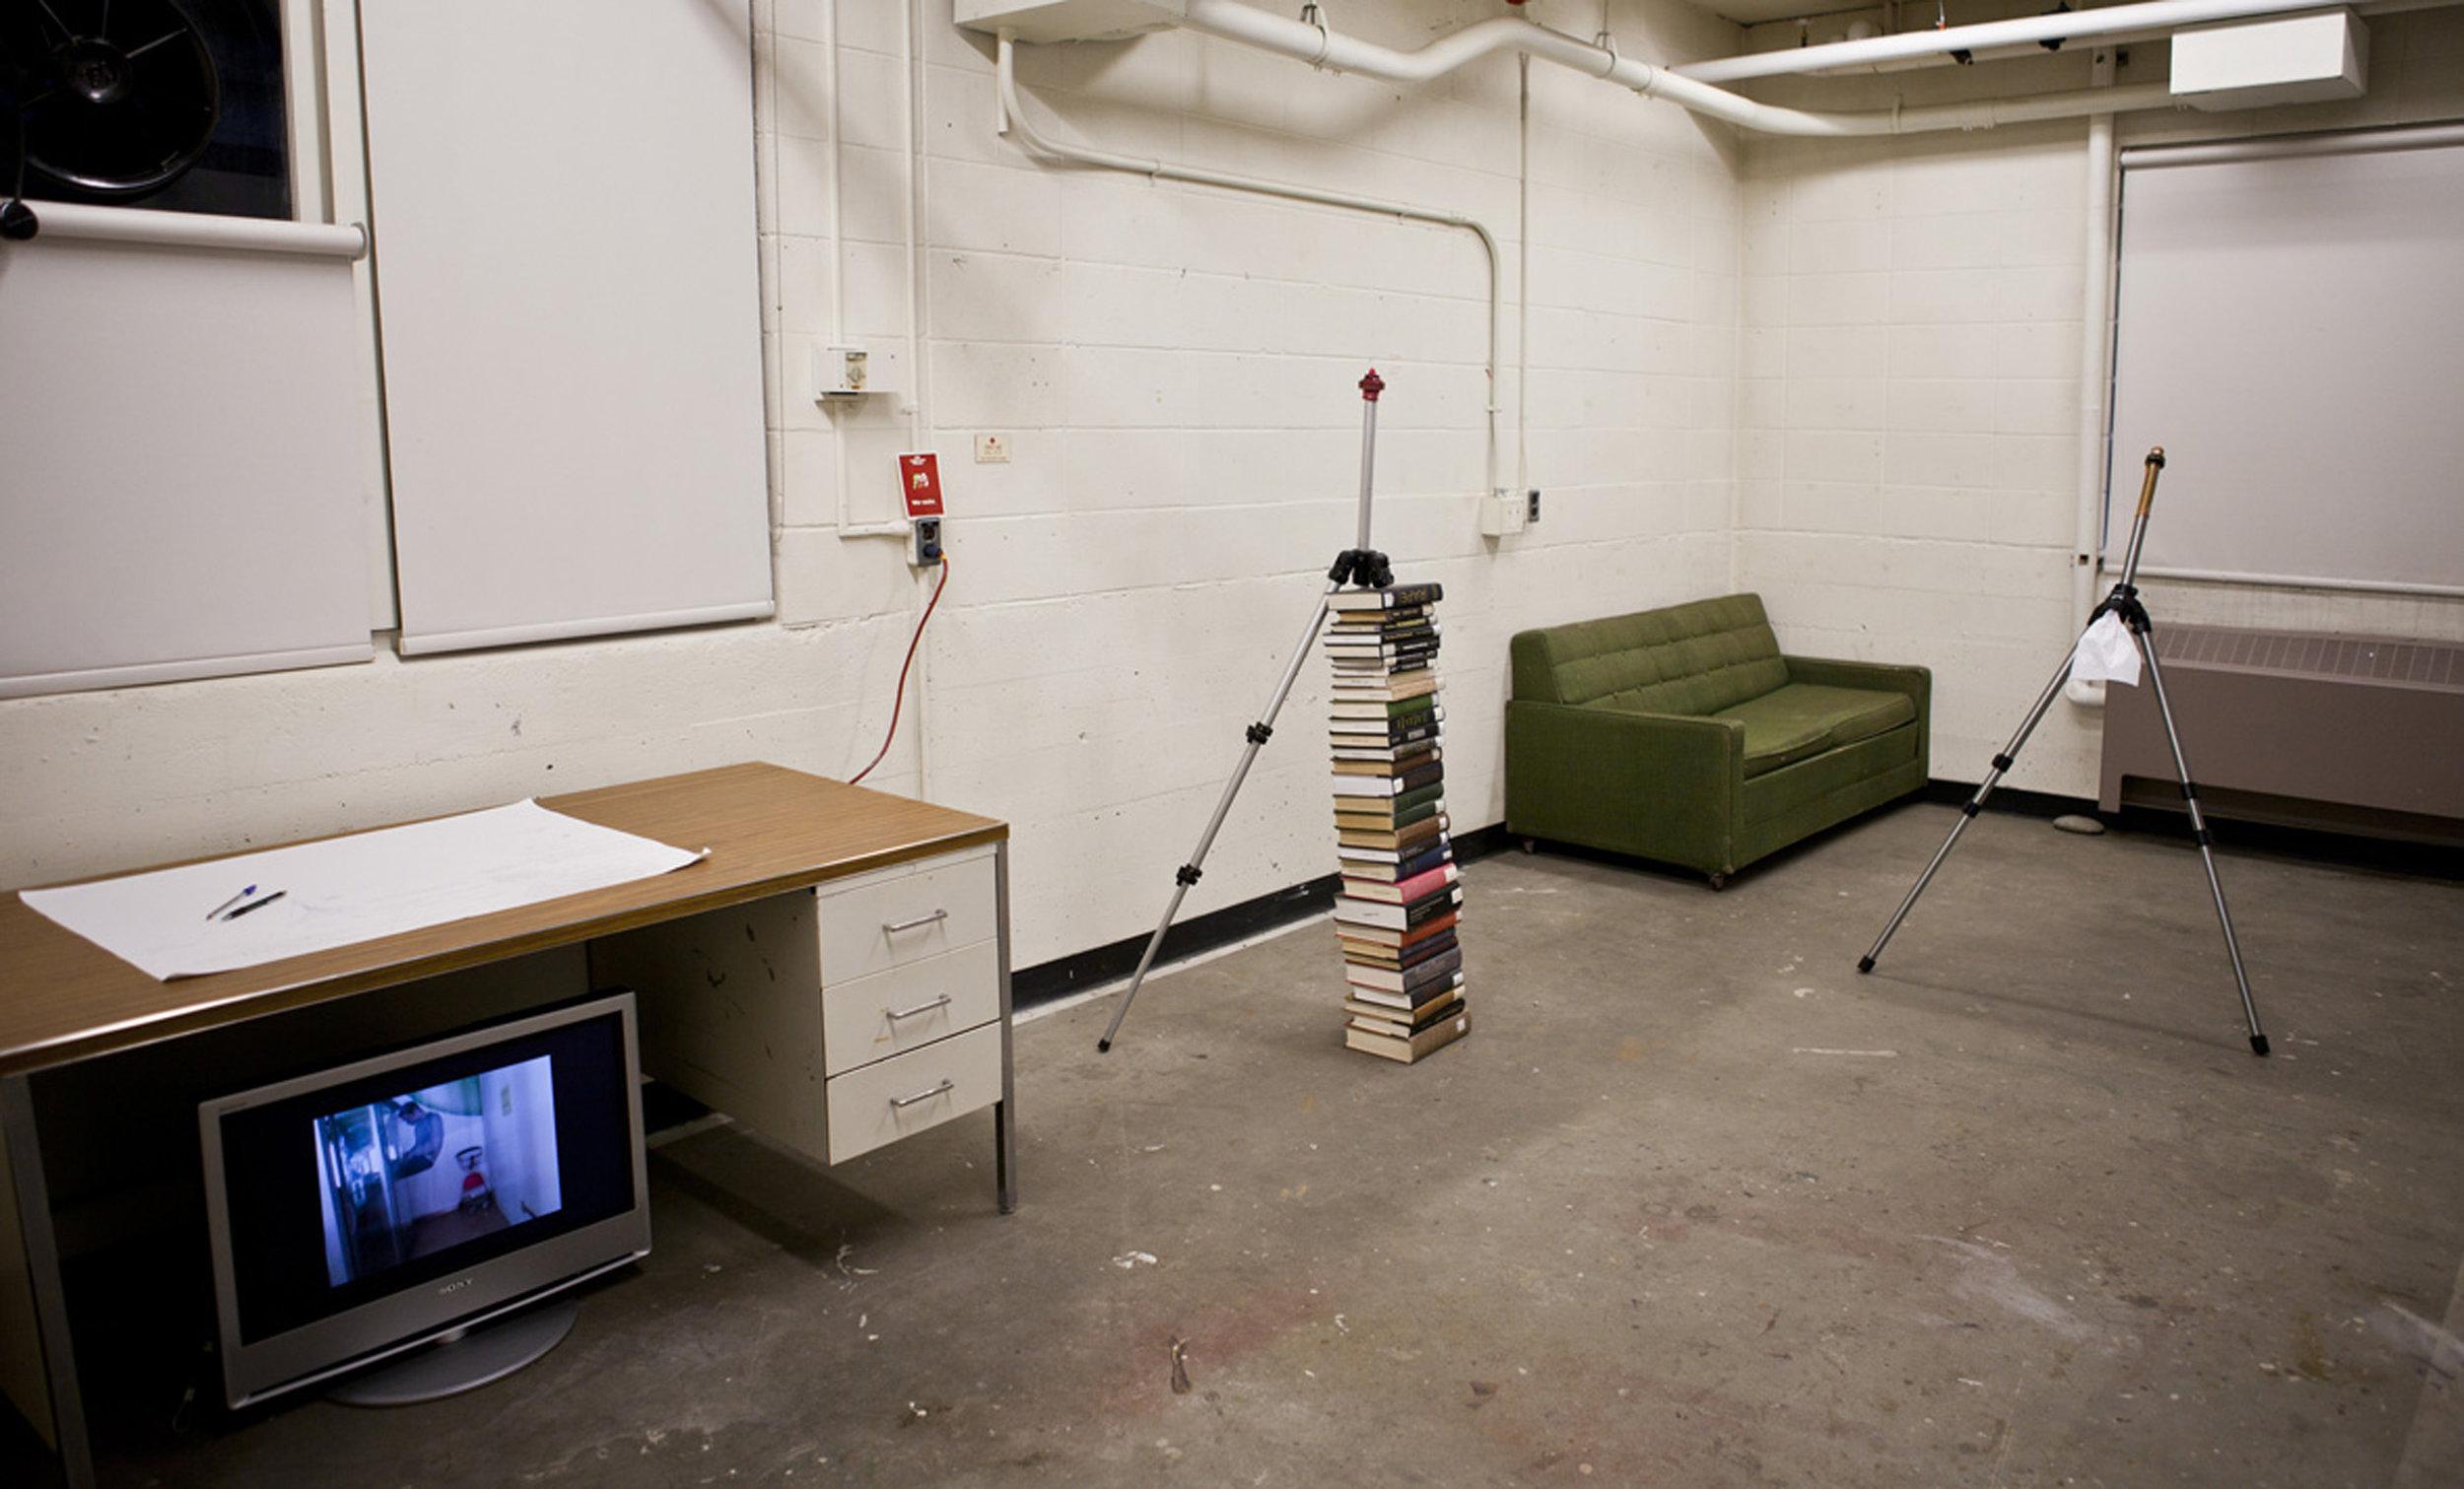 aluminum tripod, book, latex condom, working table, digital monitor, single channel video (Installation view)